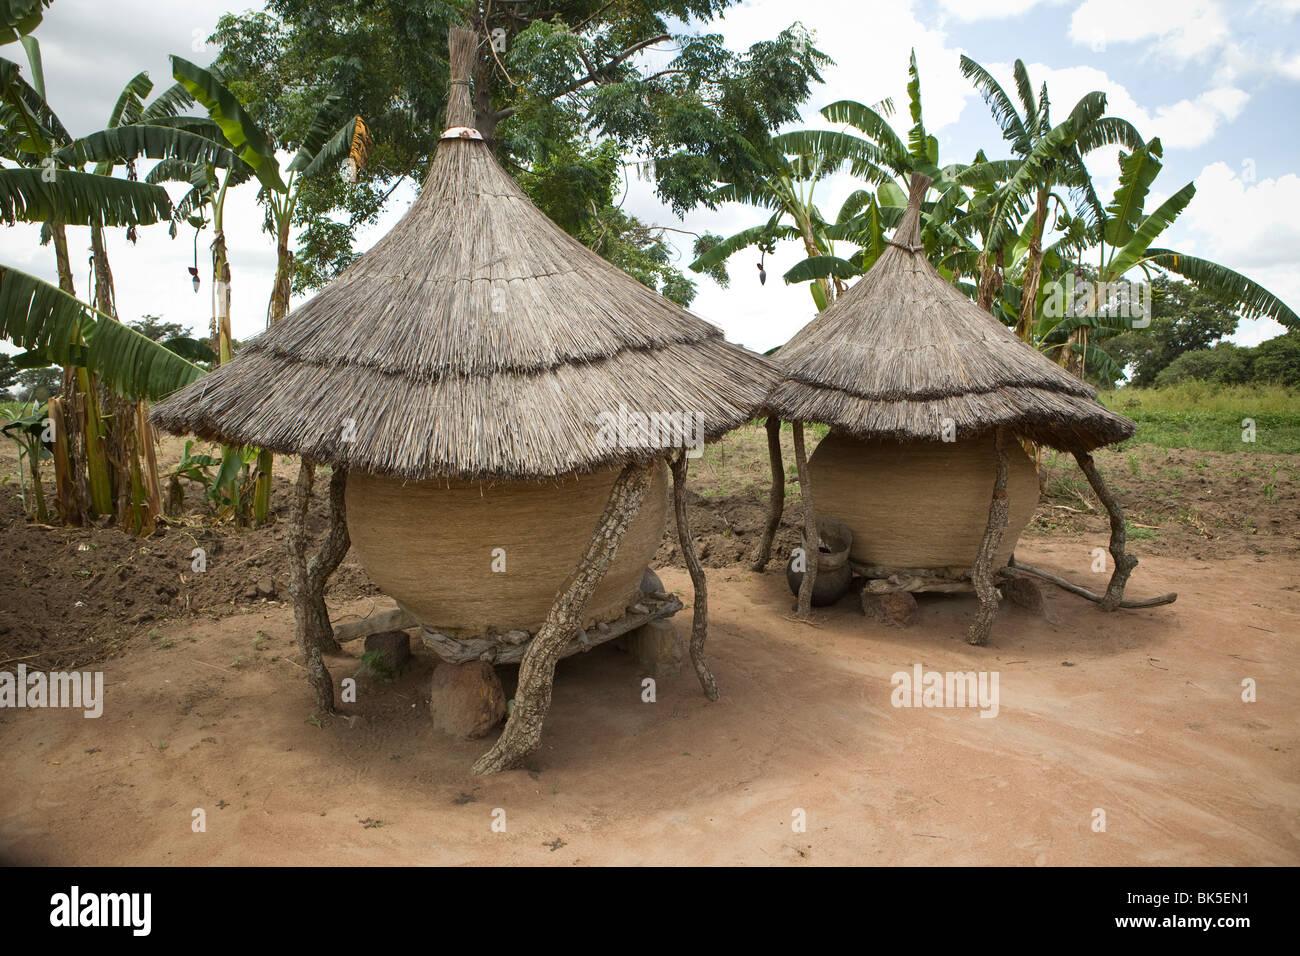 Grain storage baskets - Amuria District, Teso Subregion, Uganda, East Africa. - Stock Image